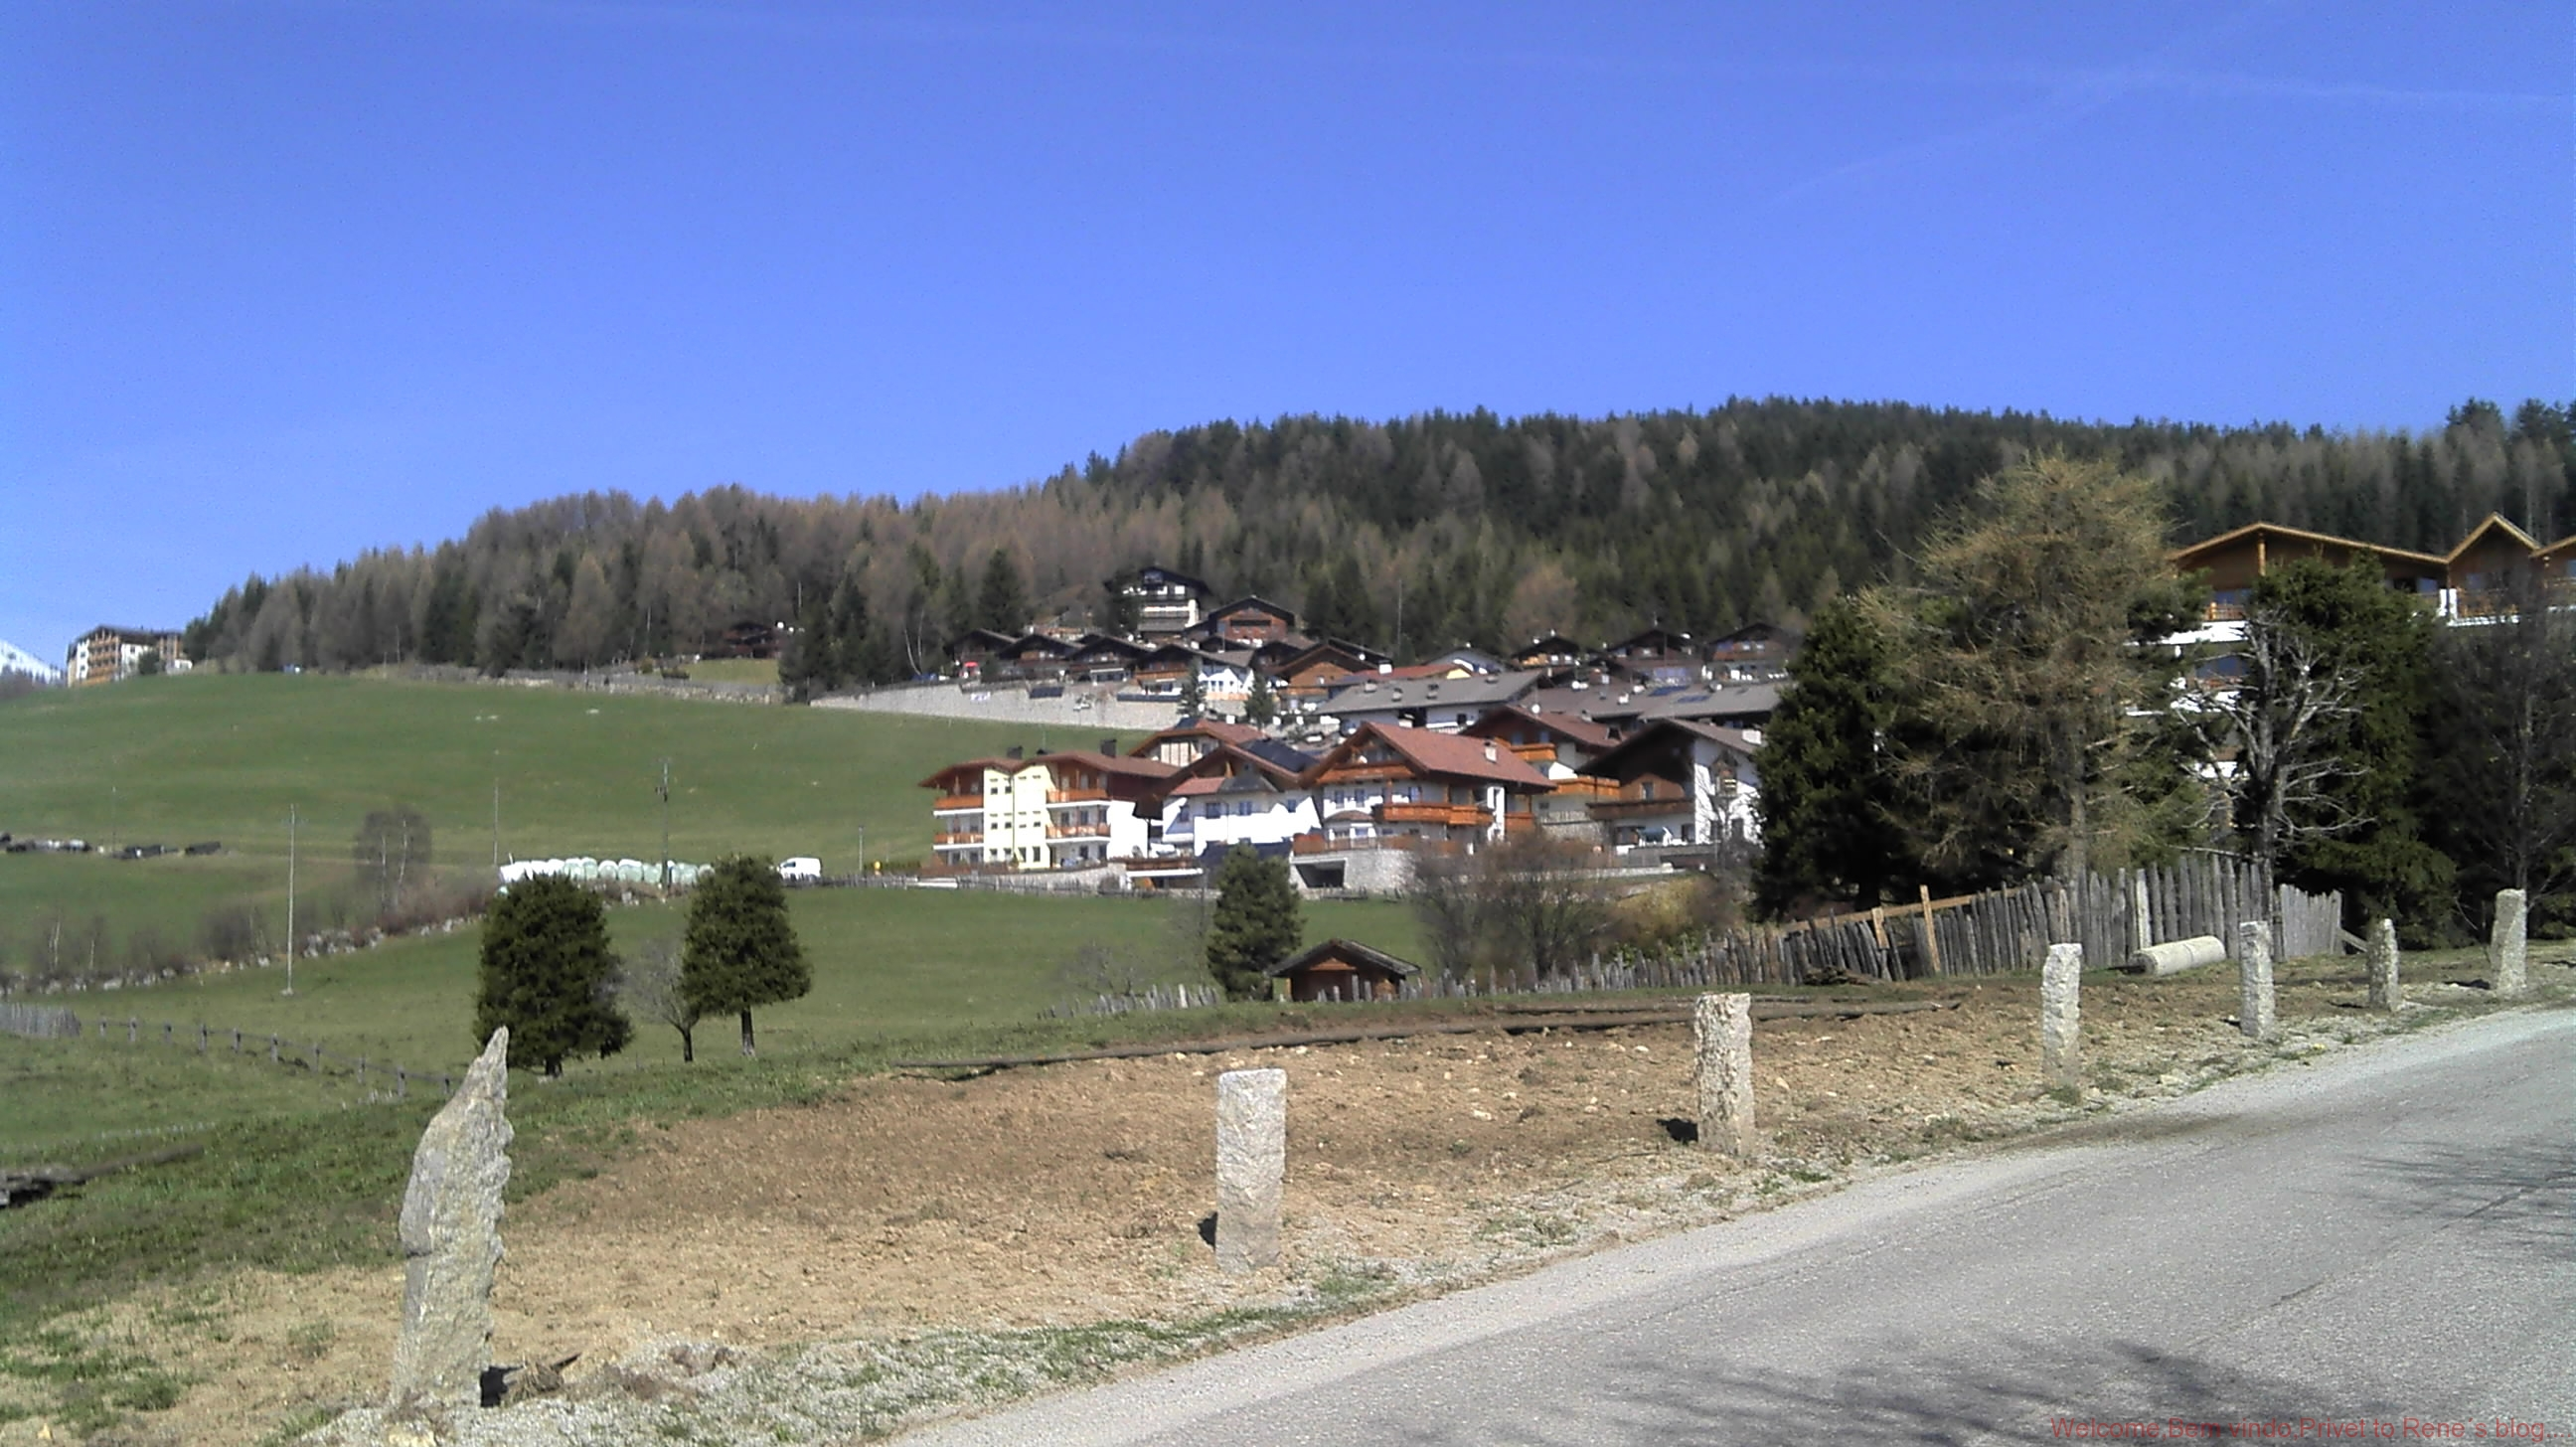 2011-04-03_10-56-19_497